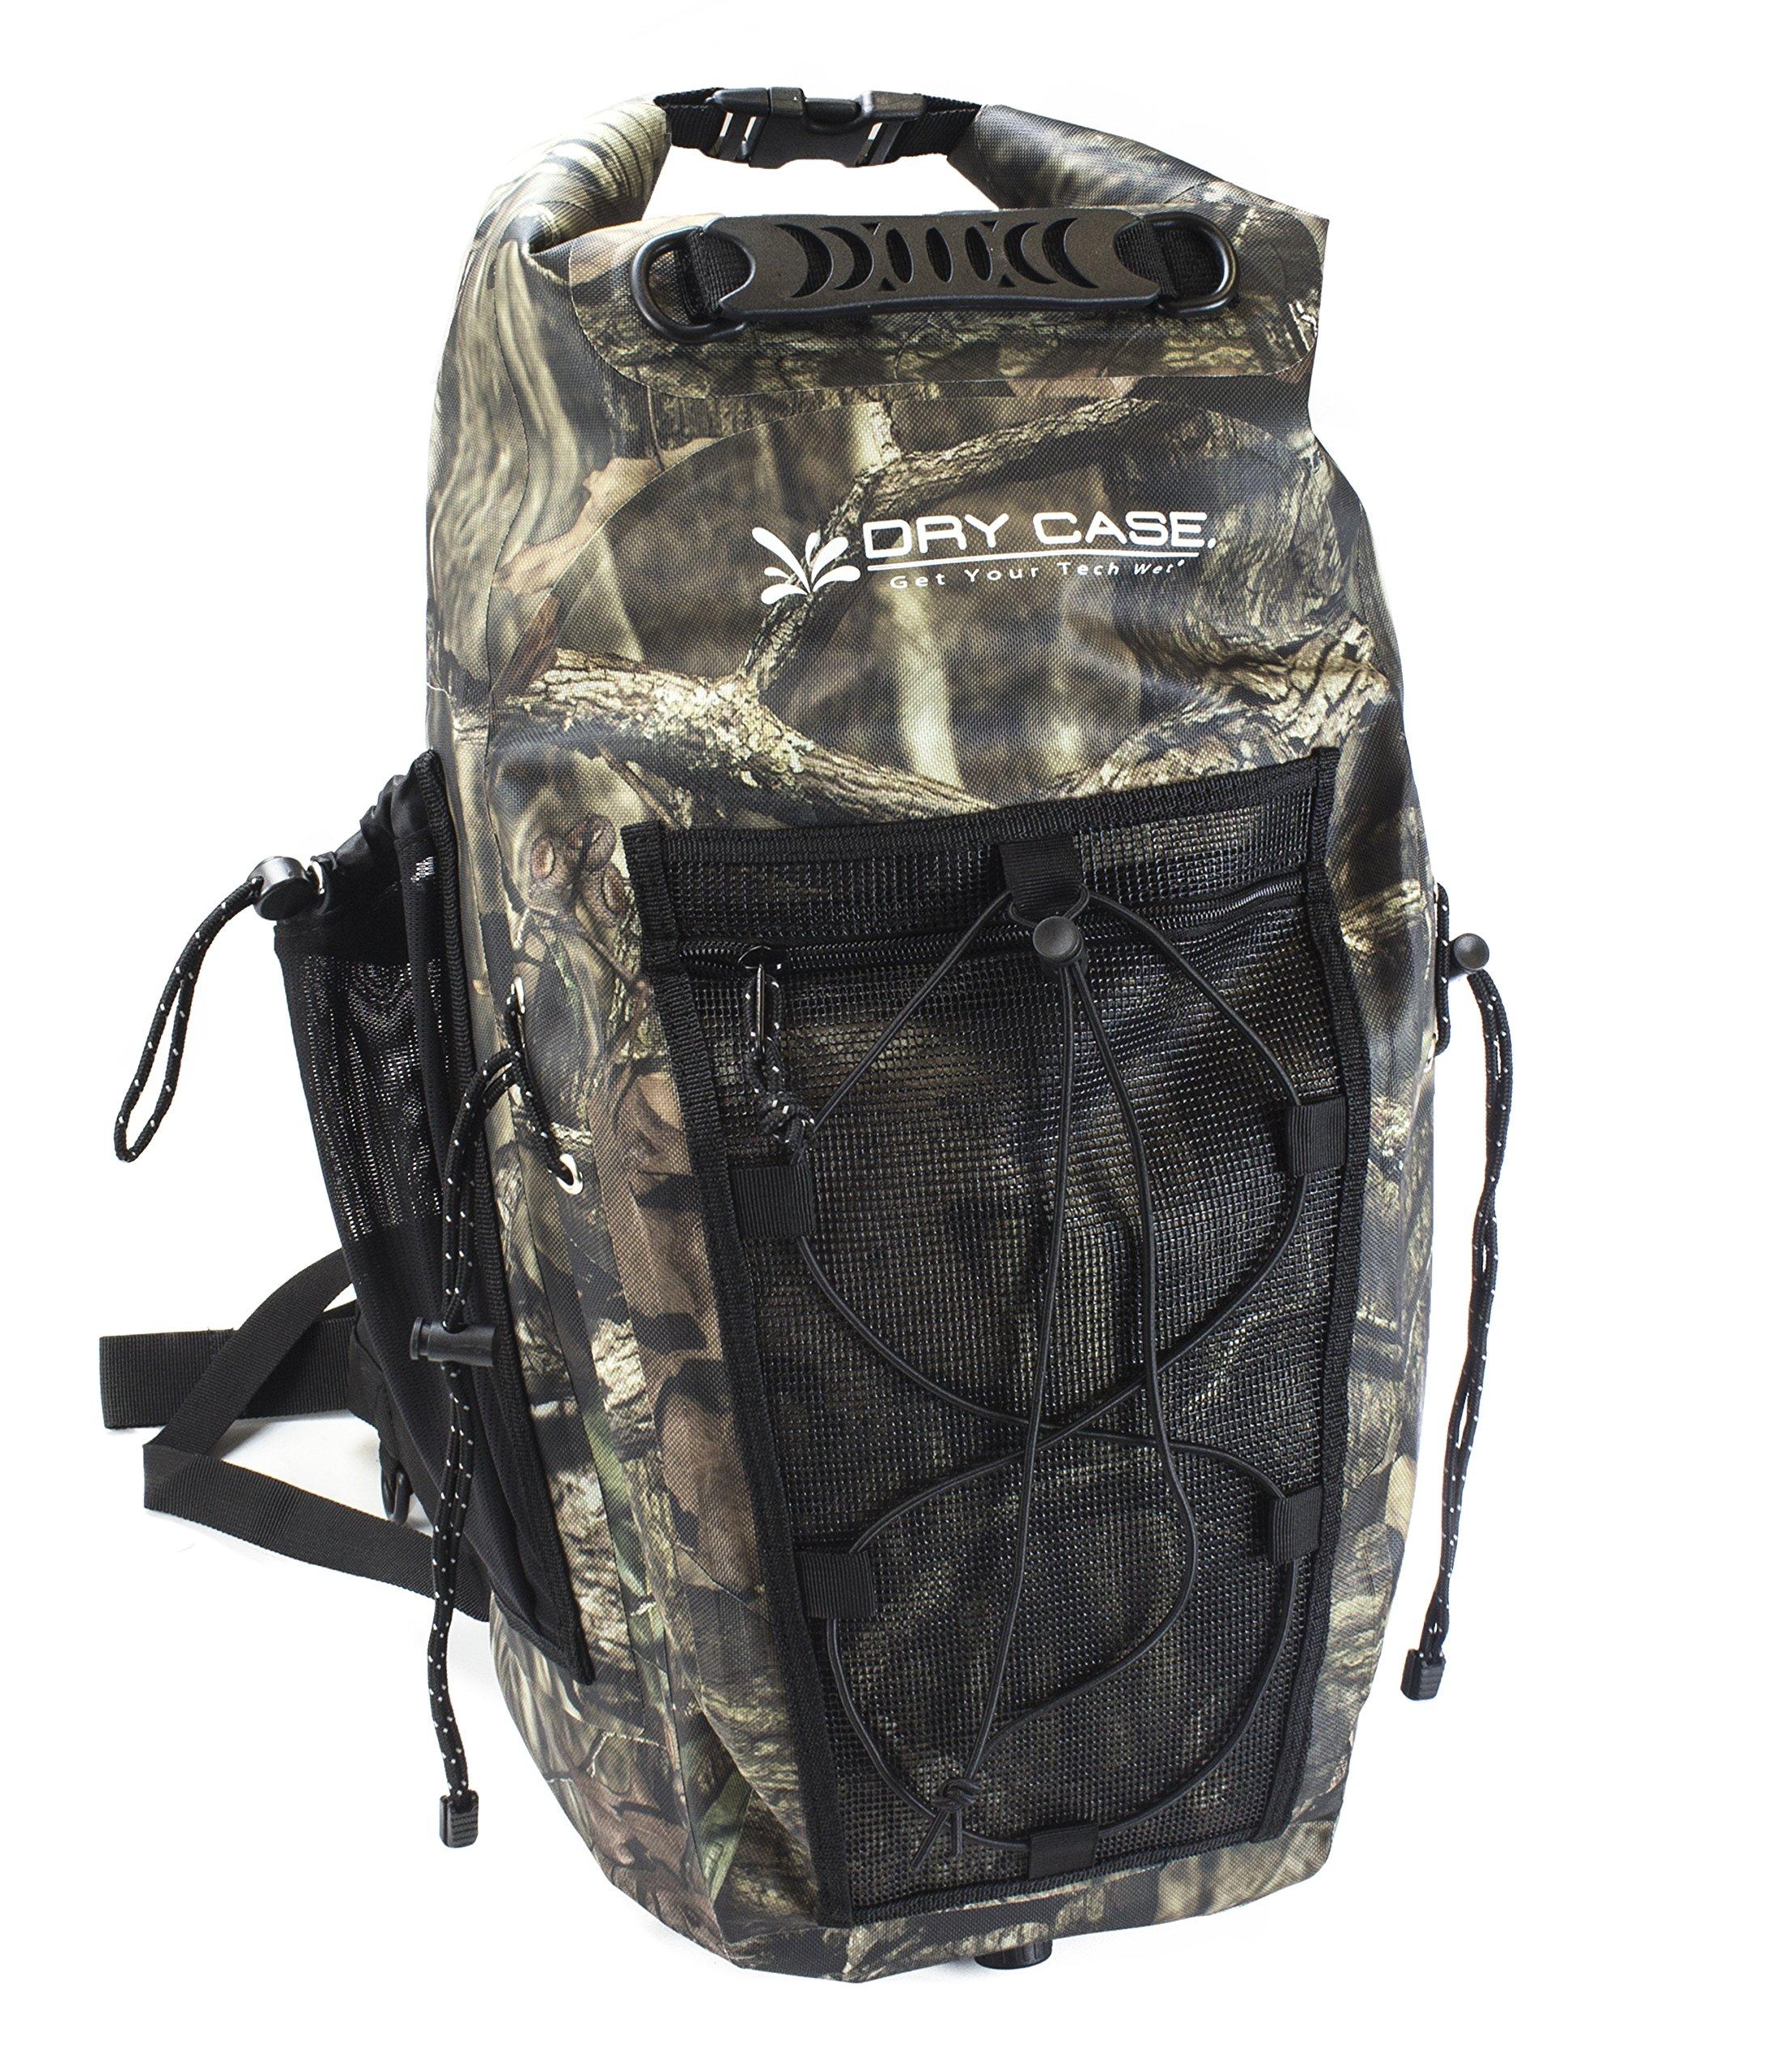 DryCase Brunswick Waterproof Camo Backpack, 35 L/Large, Break-Up Infinity